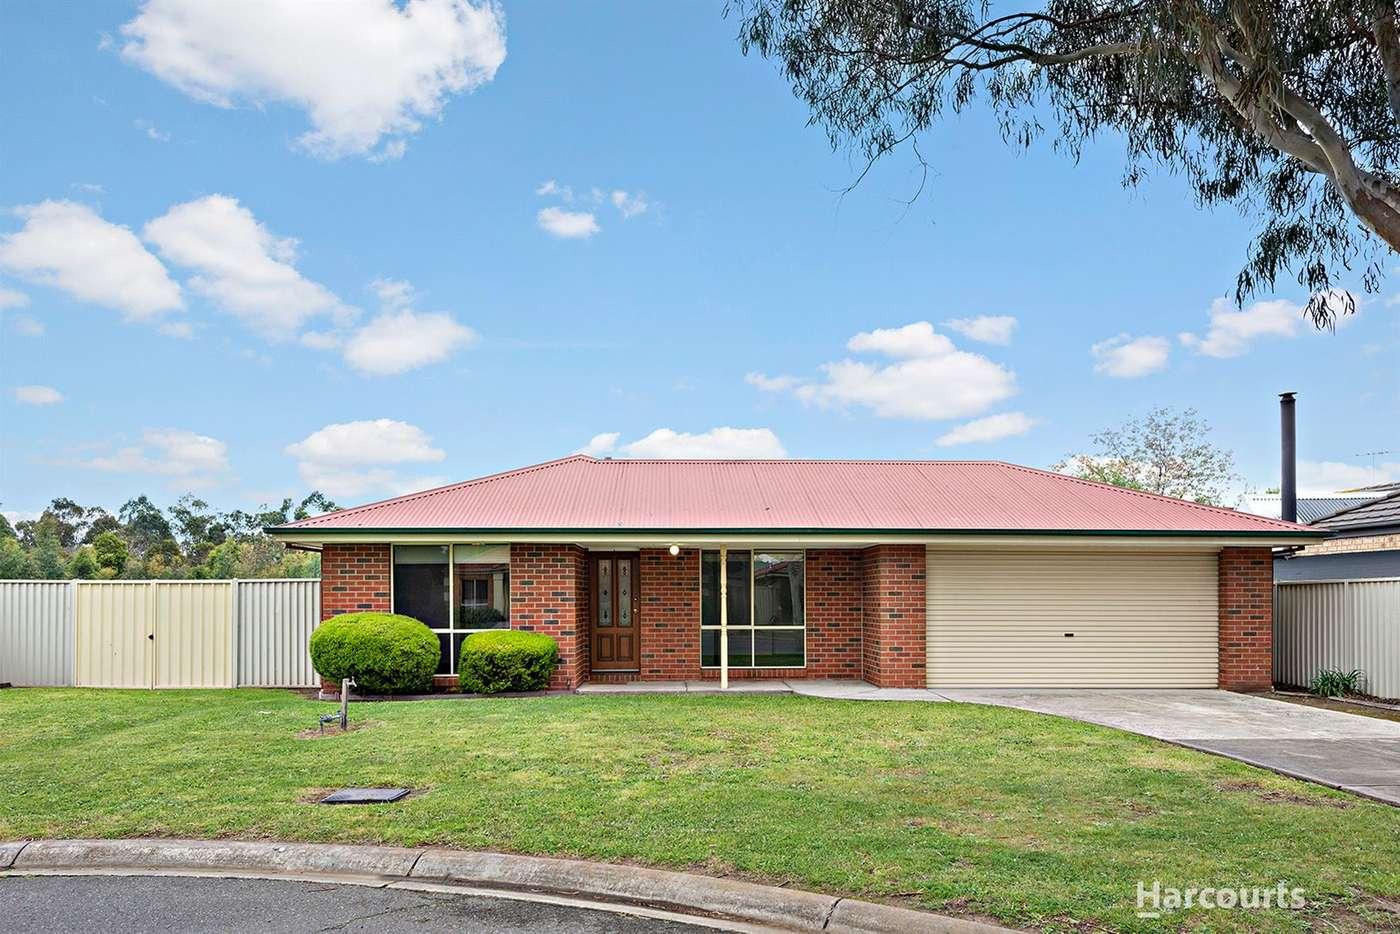 Main view of Homely house listing, 7 Creekbank Views, Pakenham VIC 3810